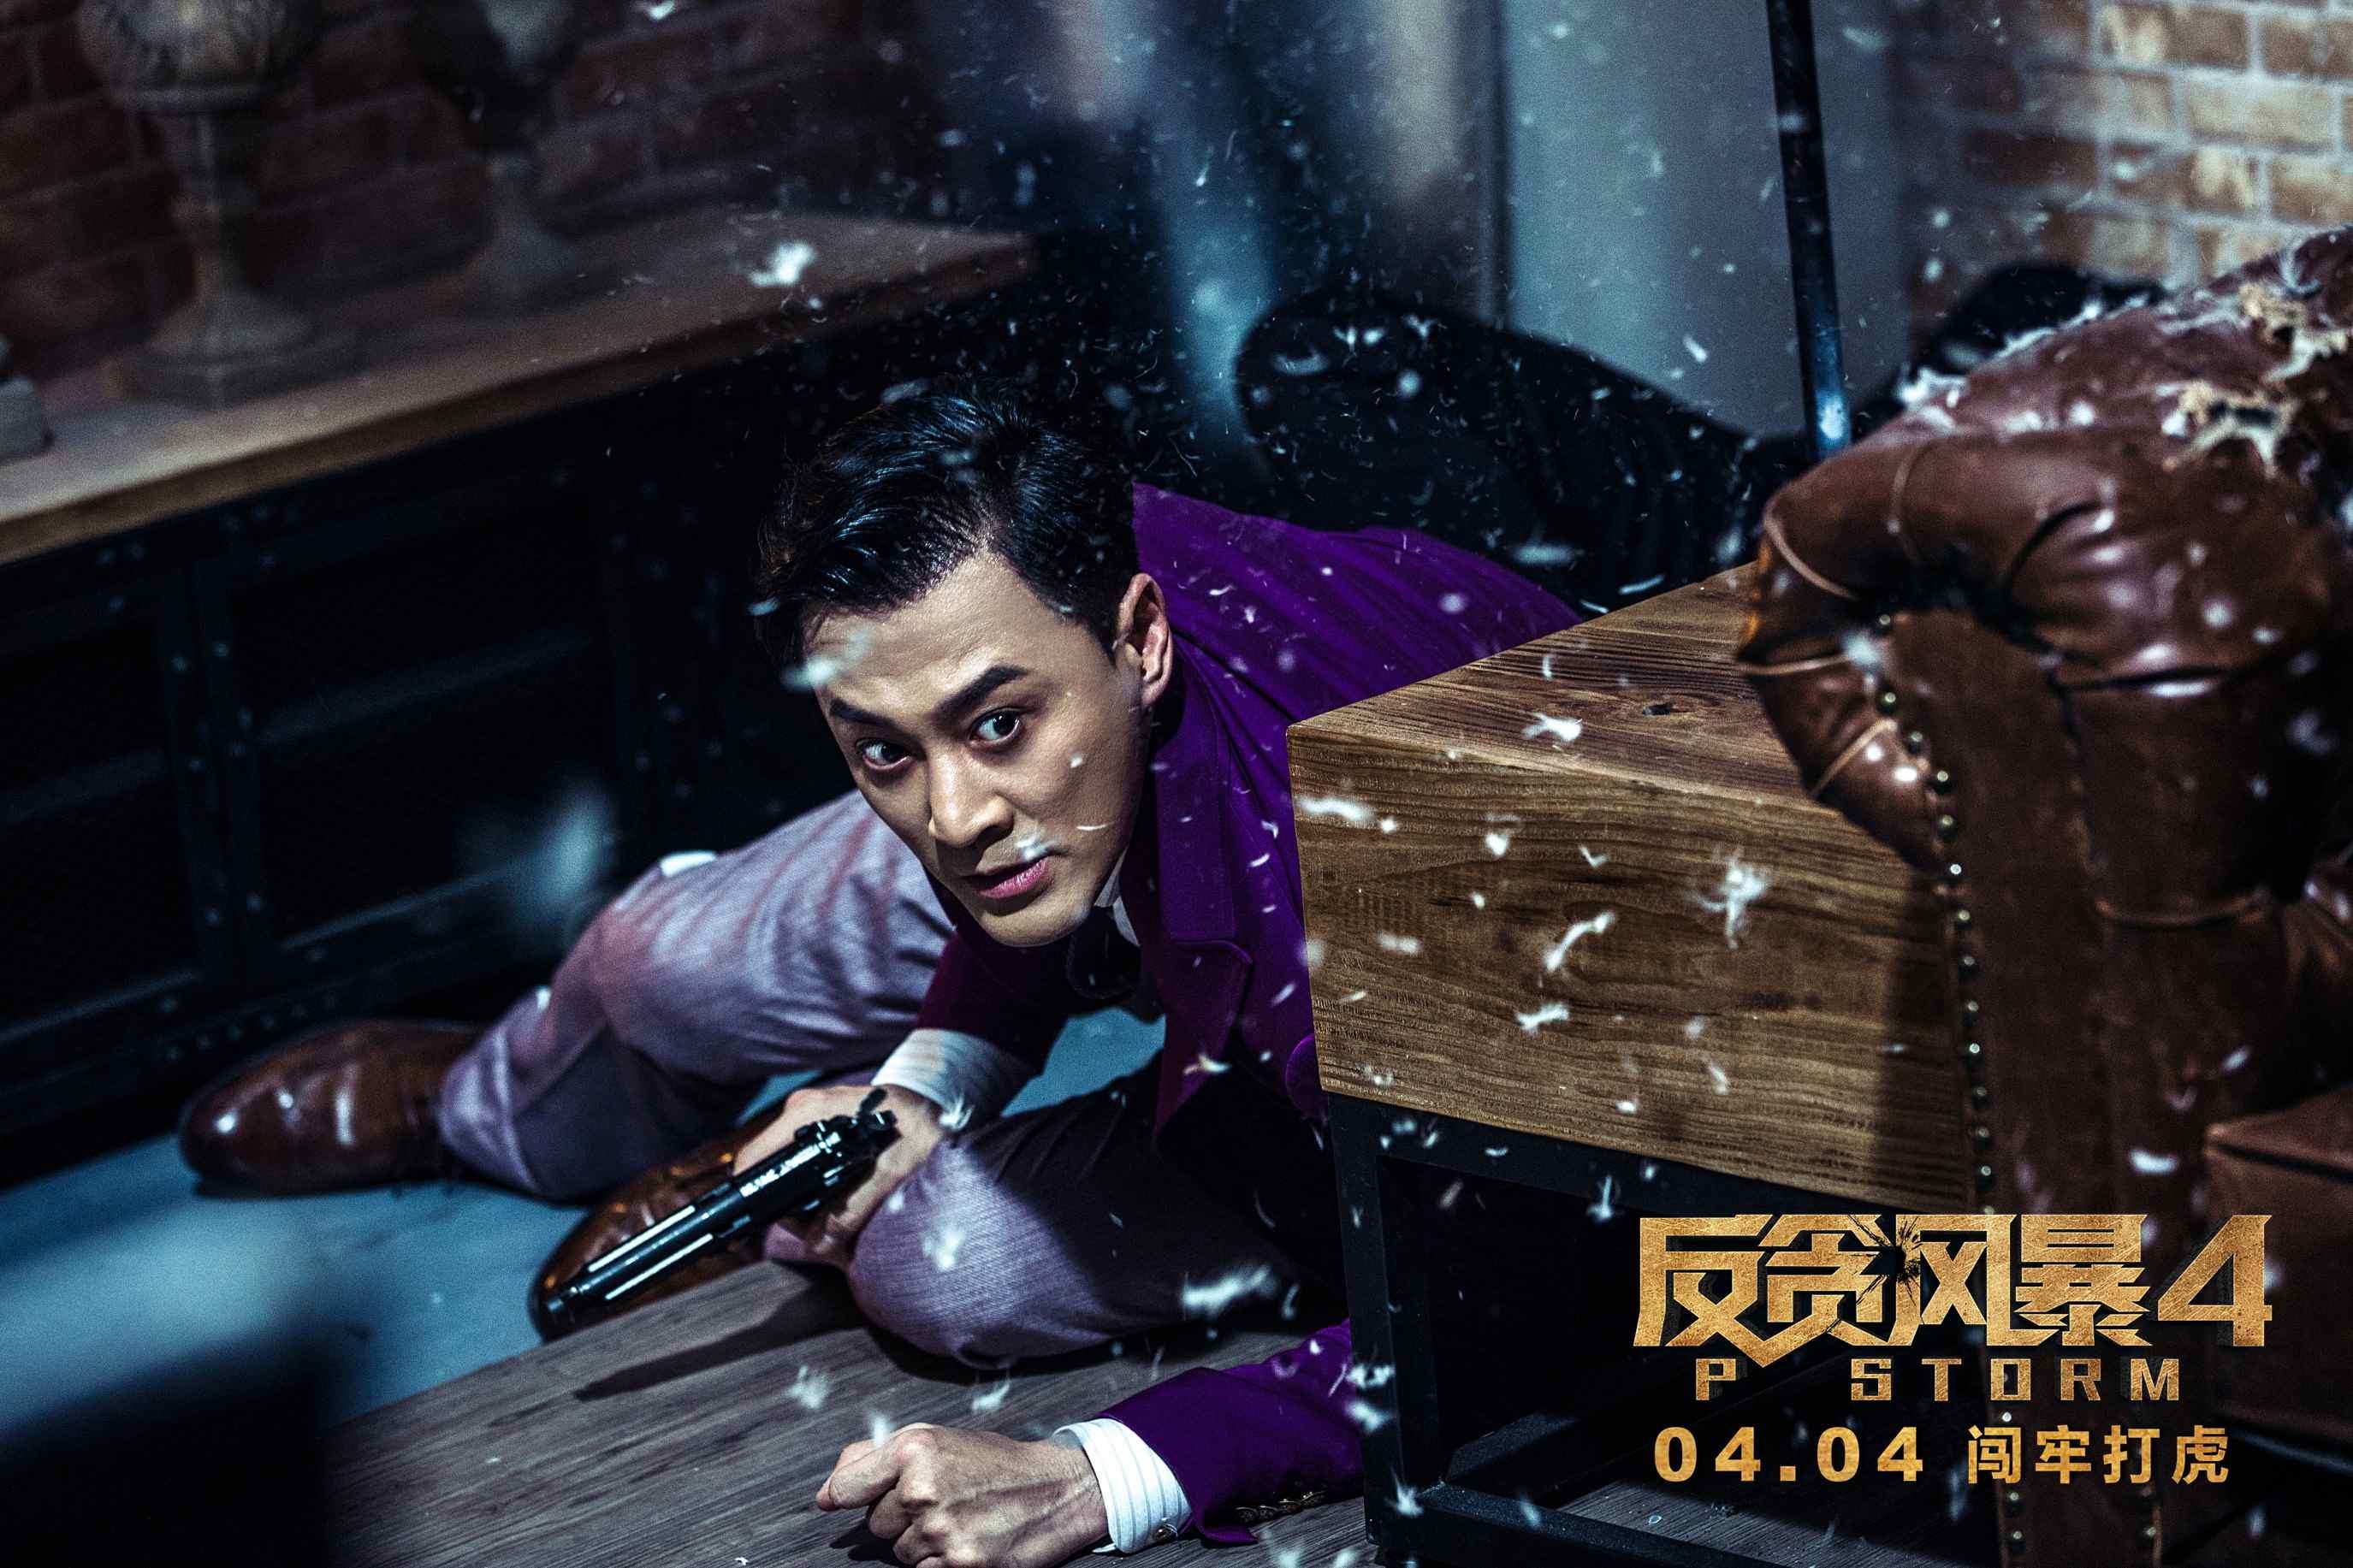 Hong Kong film 'P Storm' comes back to lead holiday box